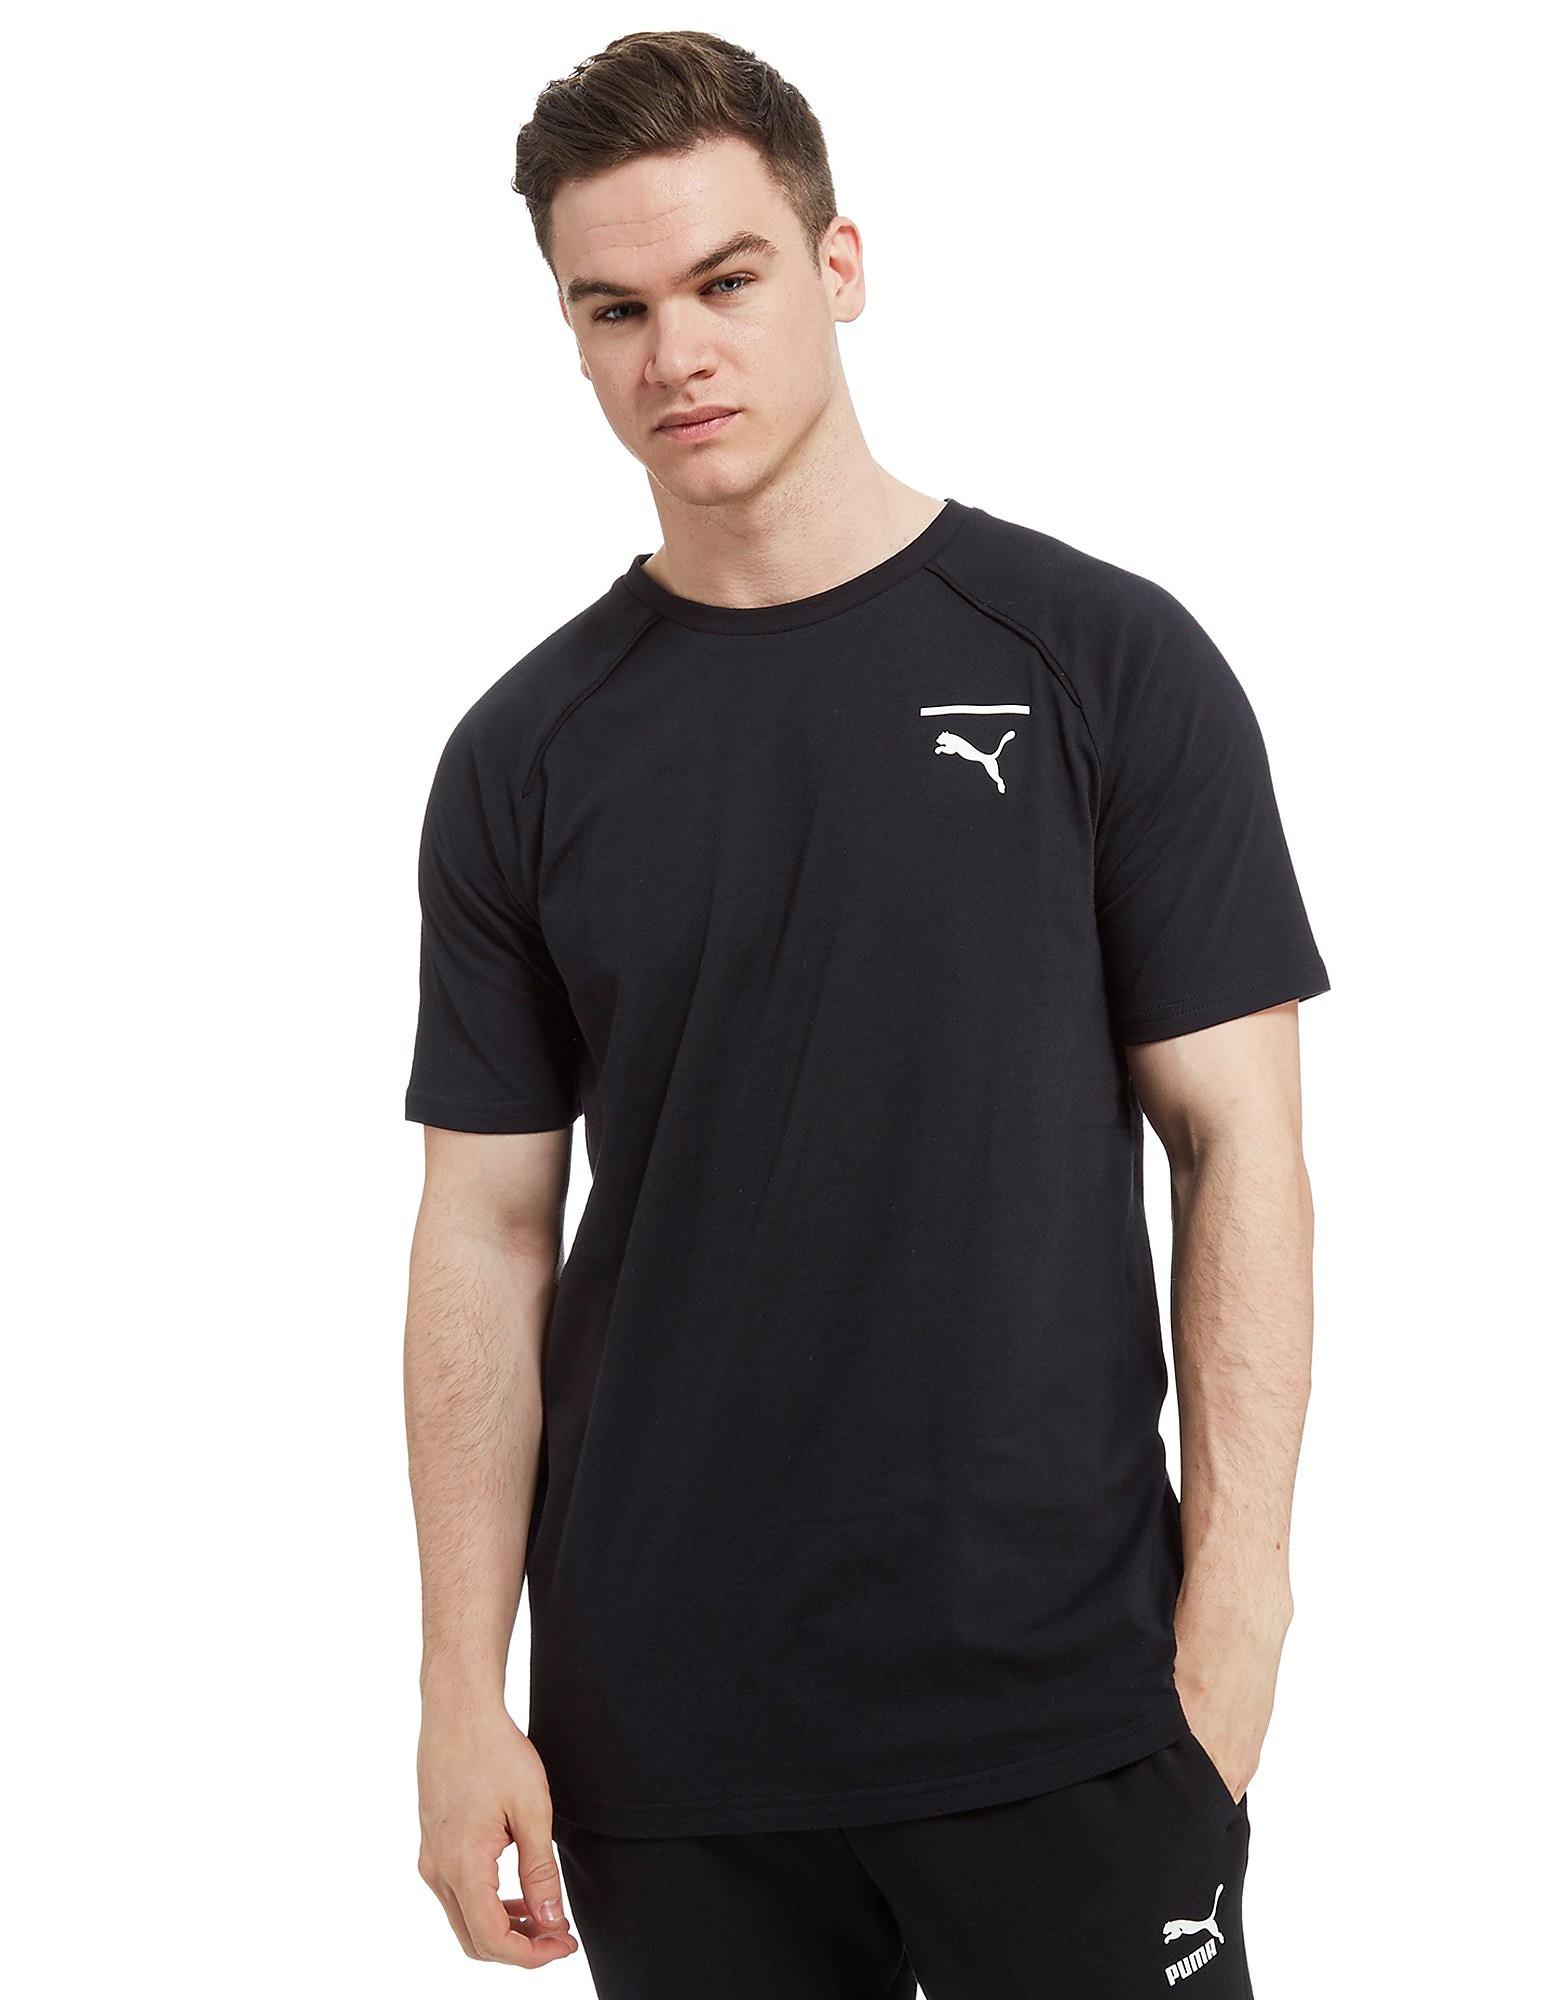 PUMA Evostripe T-Shirt